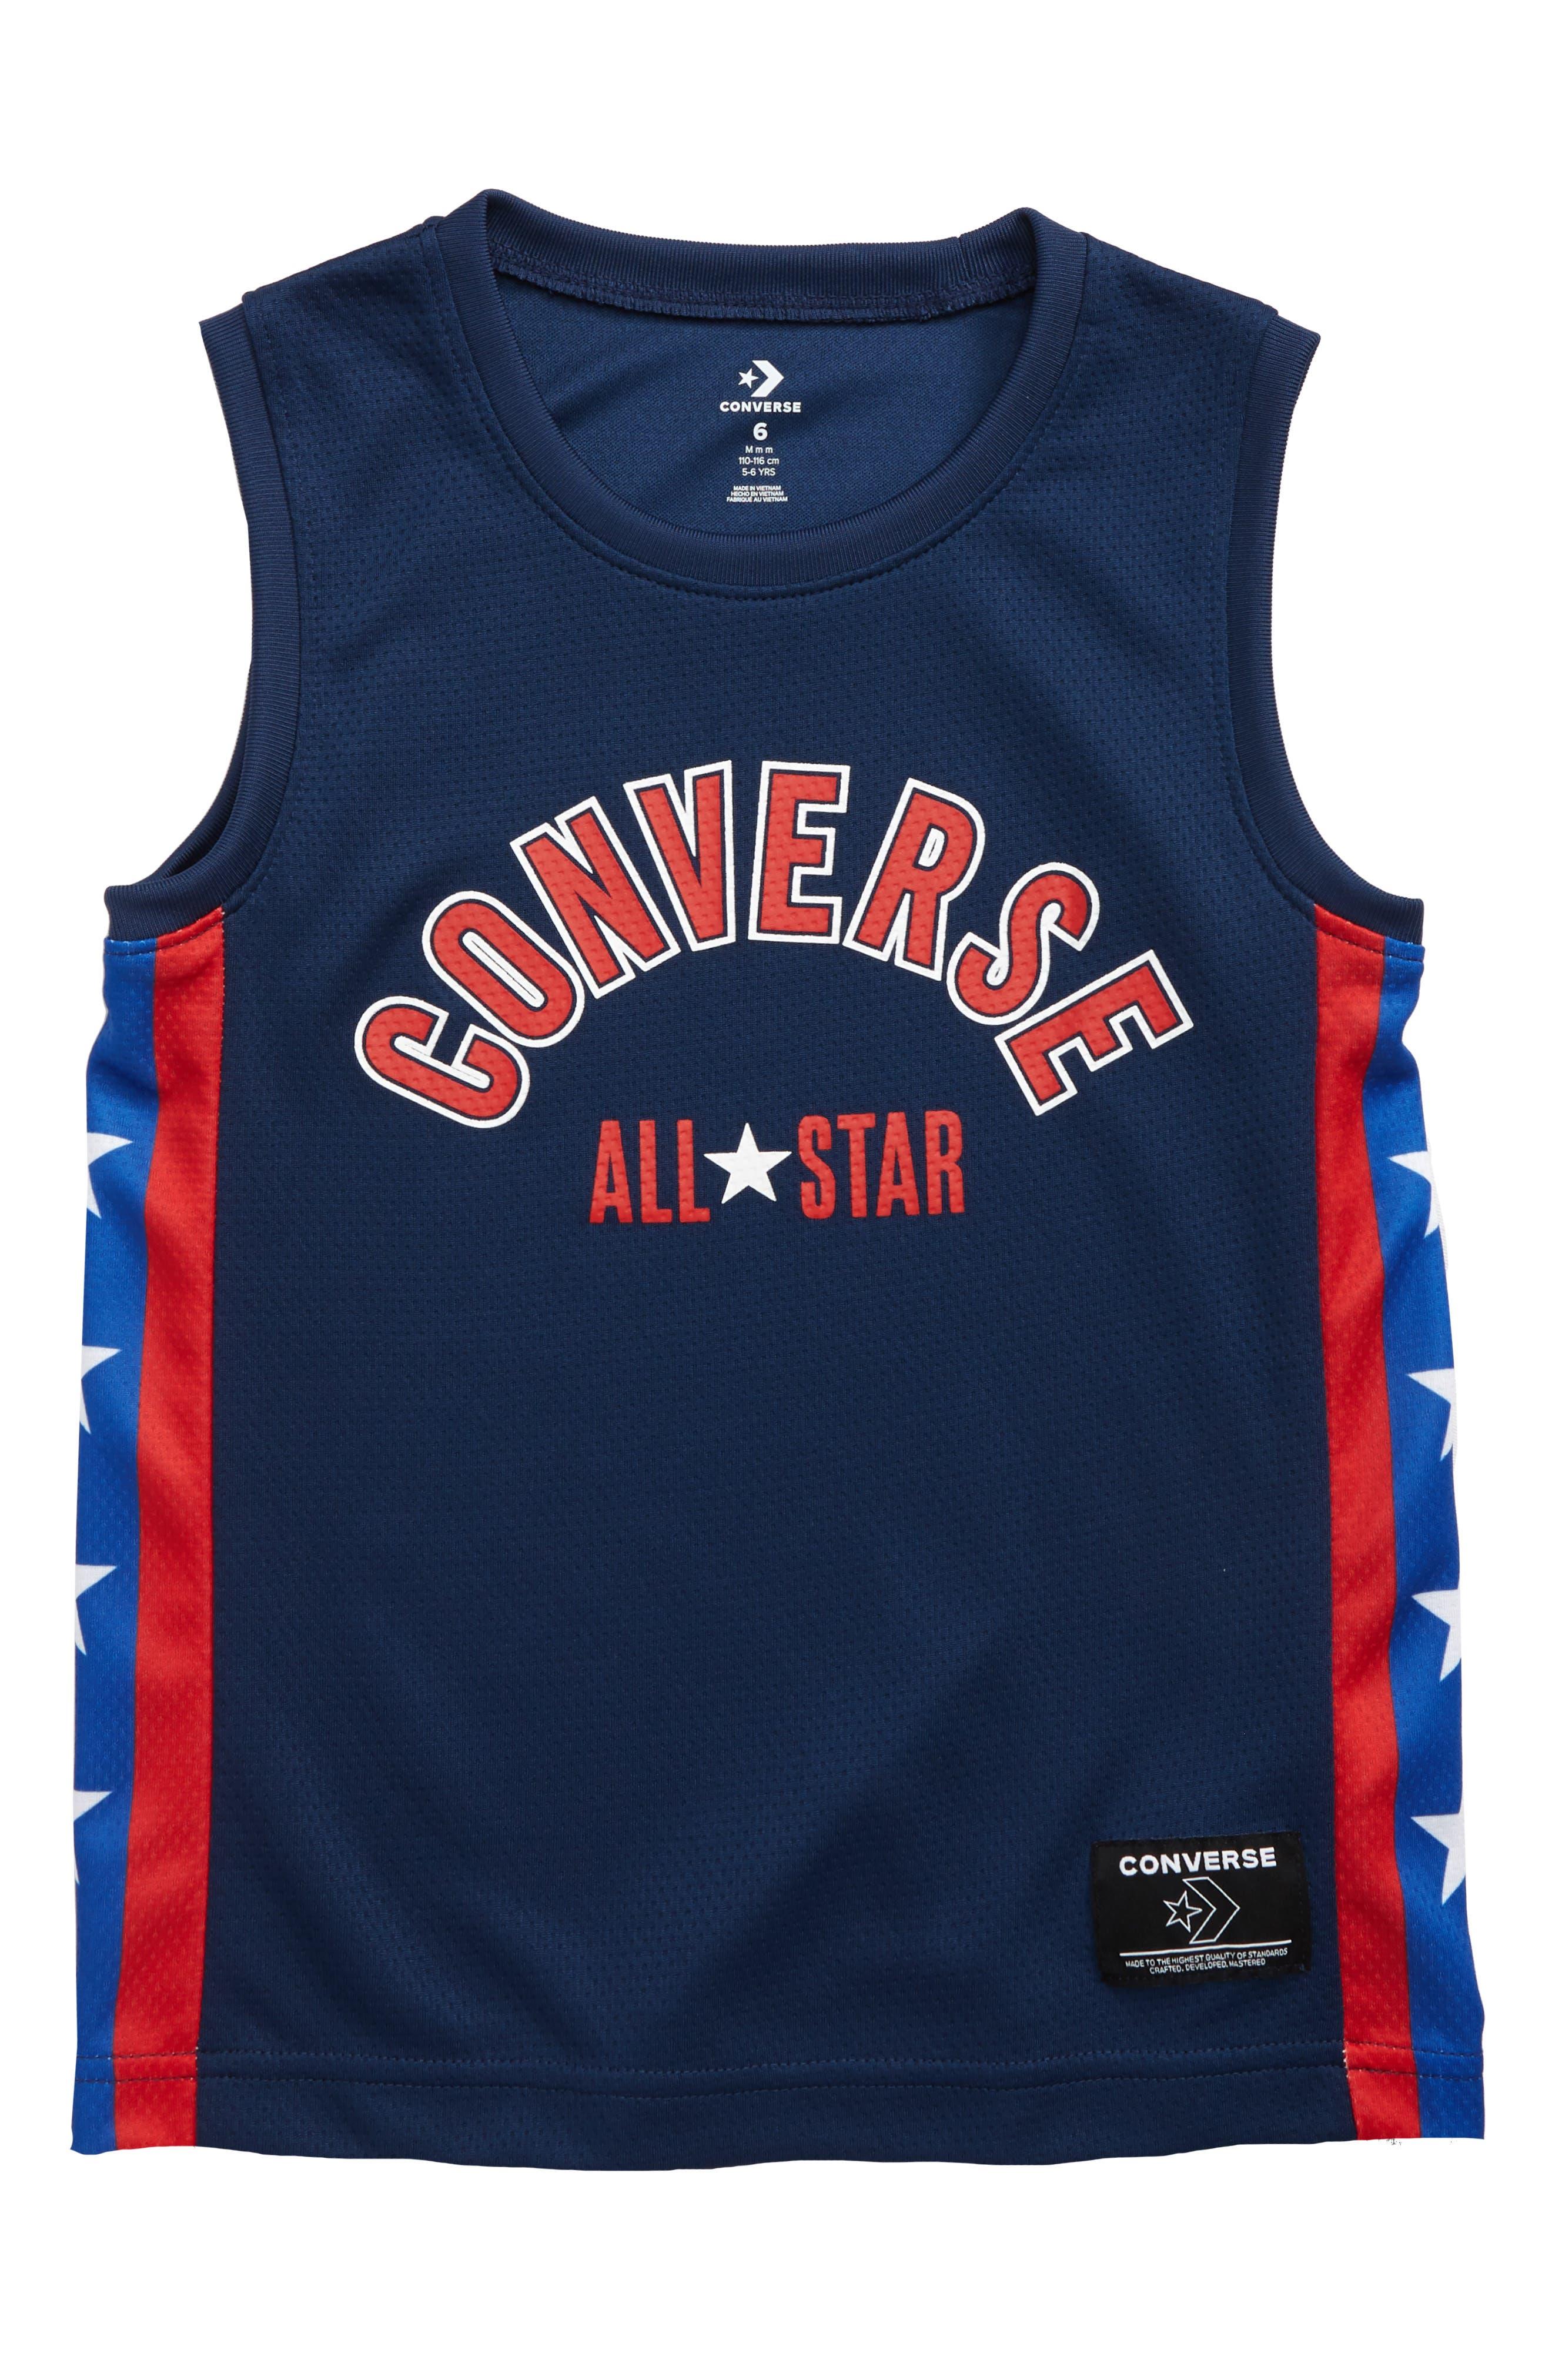 Boys Converse Star Stripe Mesh Jersey Shirt Size 4  Blue